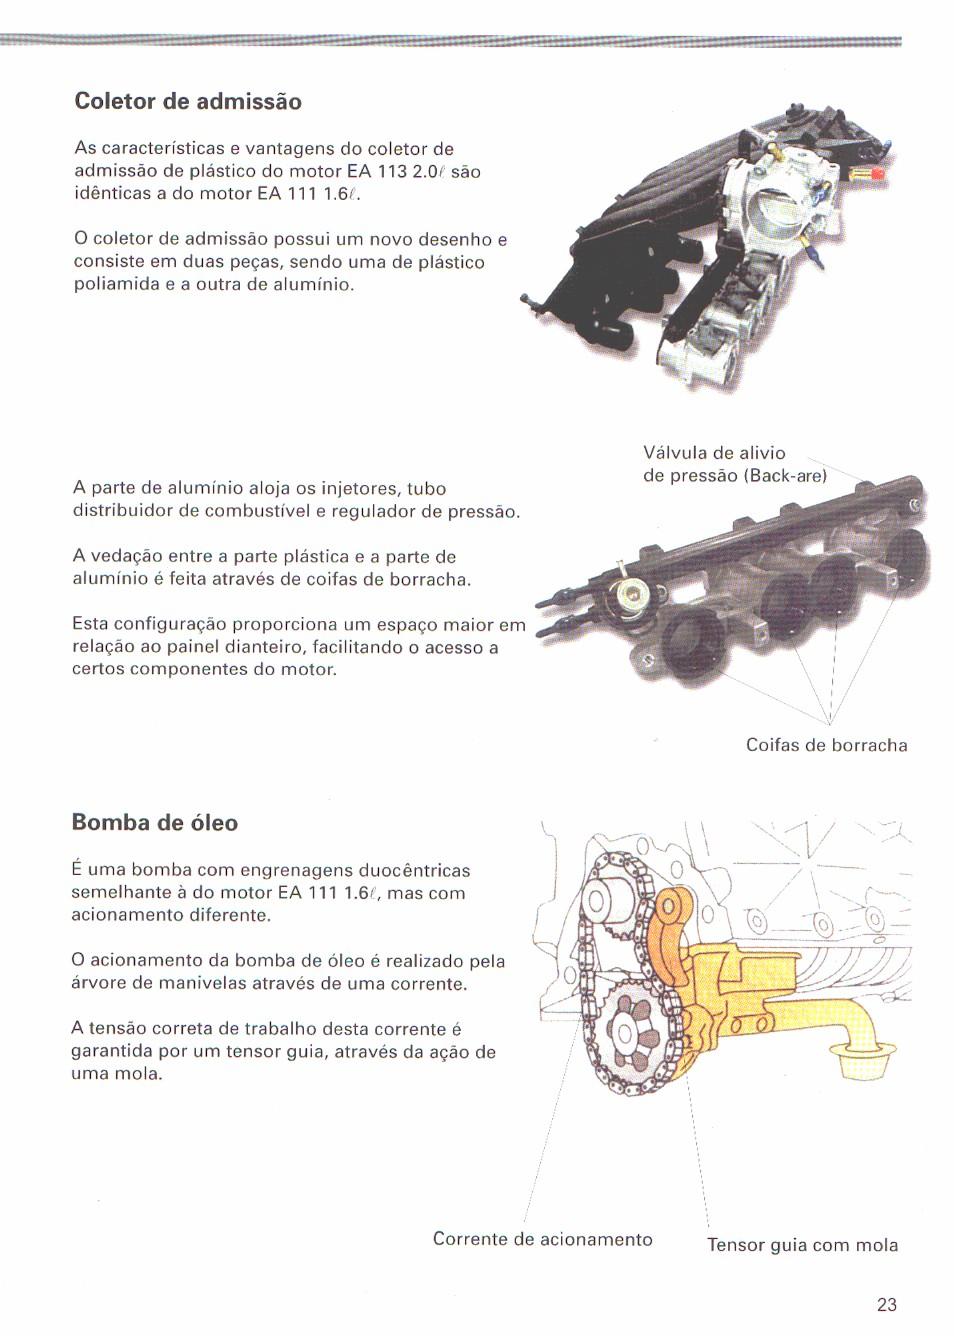 OFICINA VW : MANUAL MECANICO DE TREINAMENTO VW POLO 1.6L e